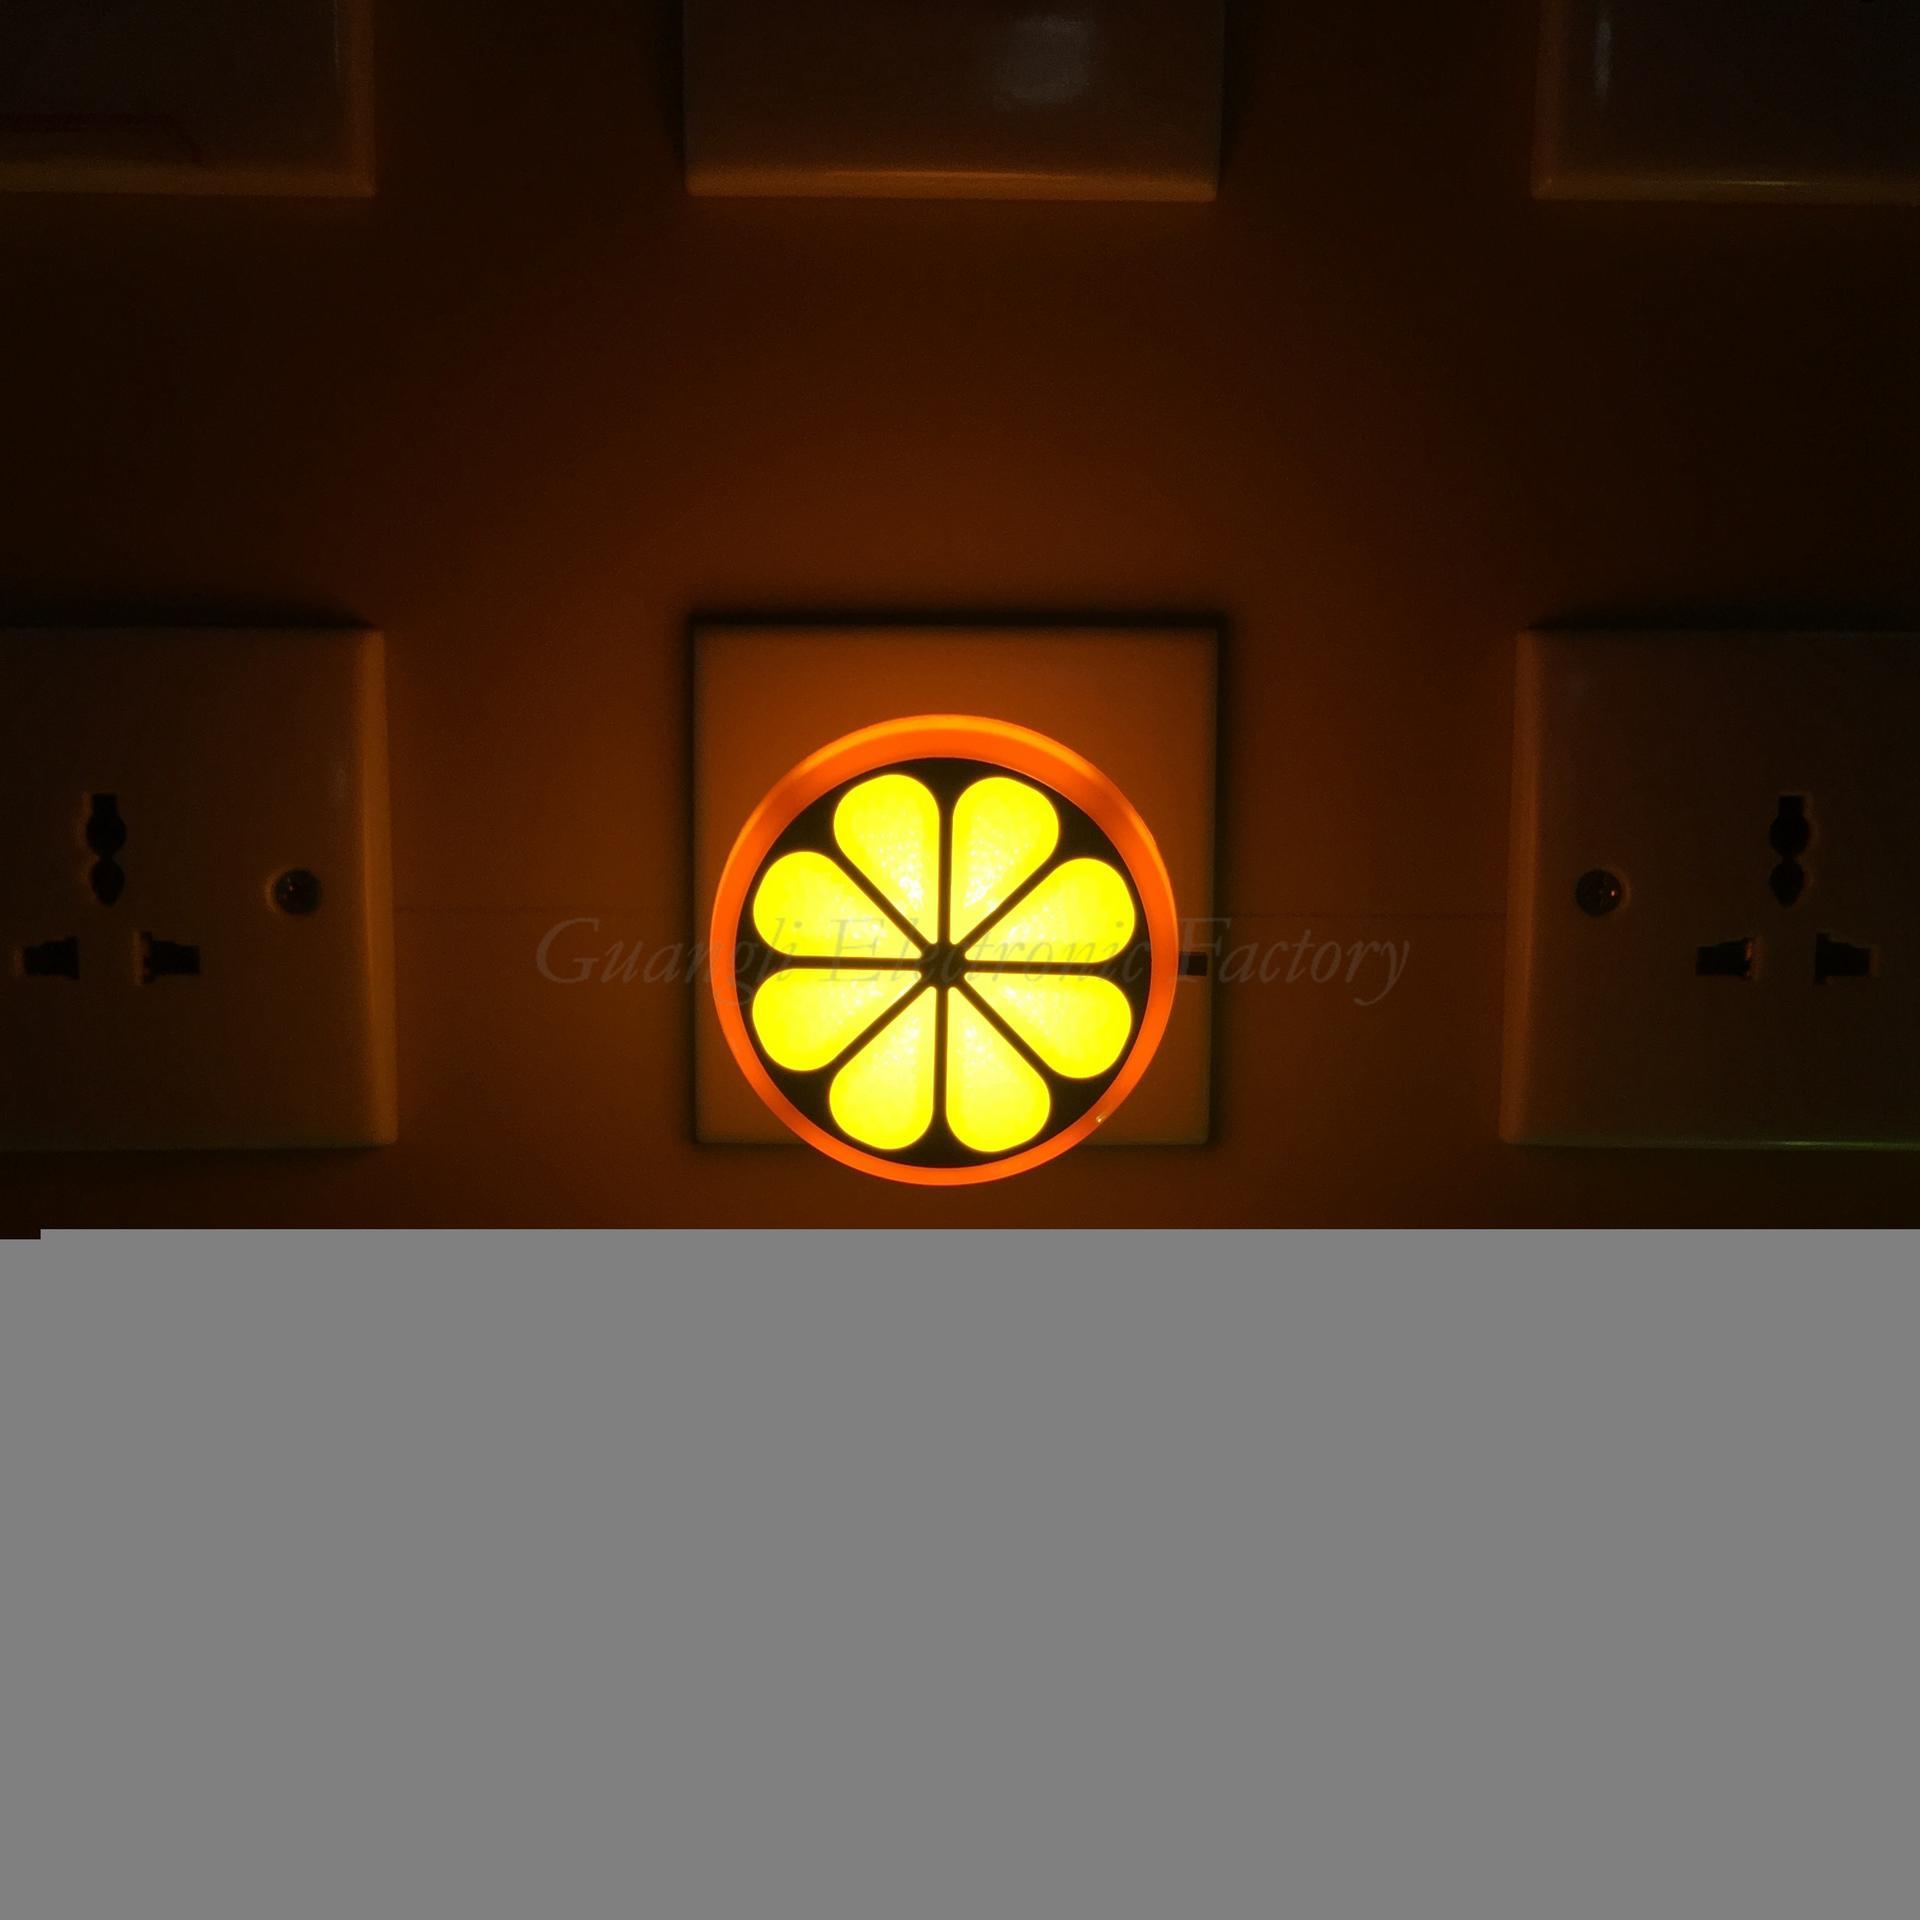 GL-W083 4SMD US EU mini switch plug in Fruits orange Shape night light For Baby Bedroom wall decoration